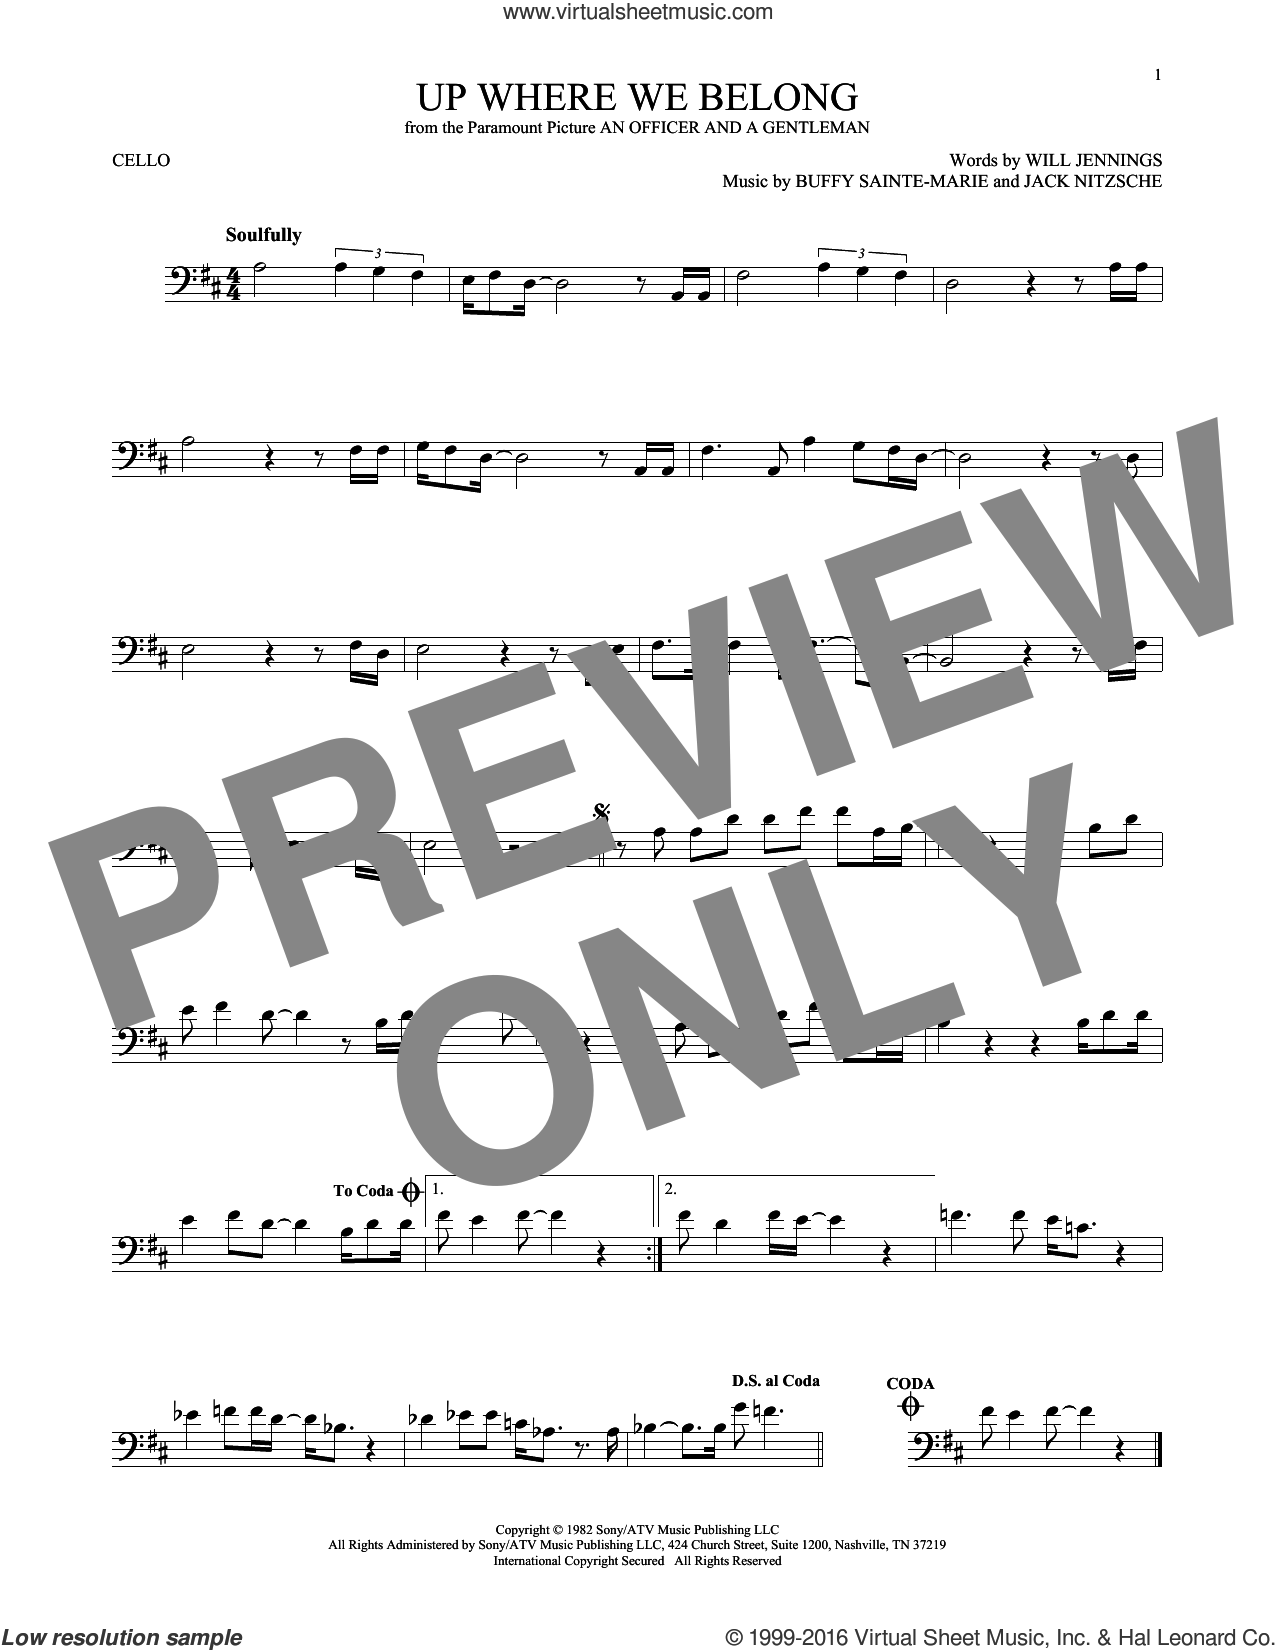 Up Where We Belong sheet music for cello solo by Joe Cocker & Jennifer Warnes, BeBe and CeCe Winans, Buffy Sainte-Marie, Jack Nitzche and Will Jennings, intermediate skill level